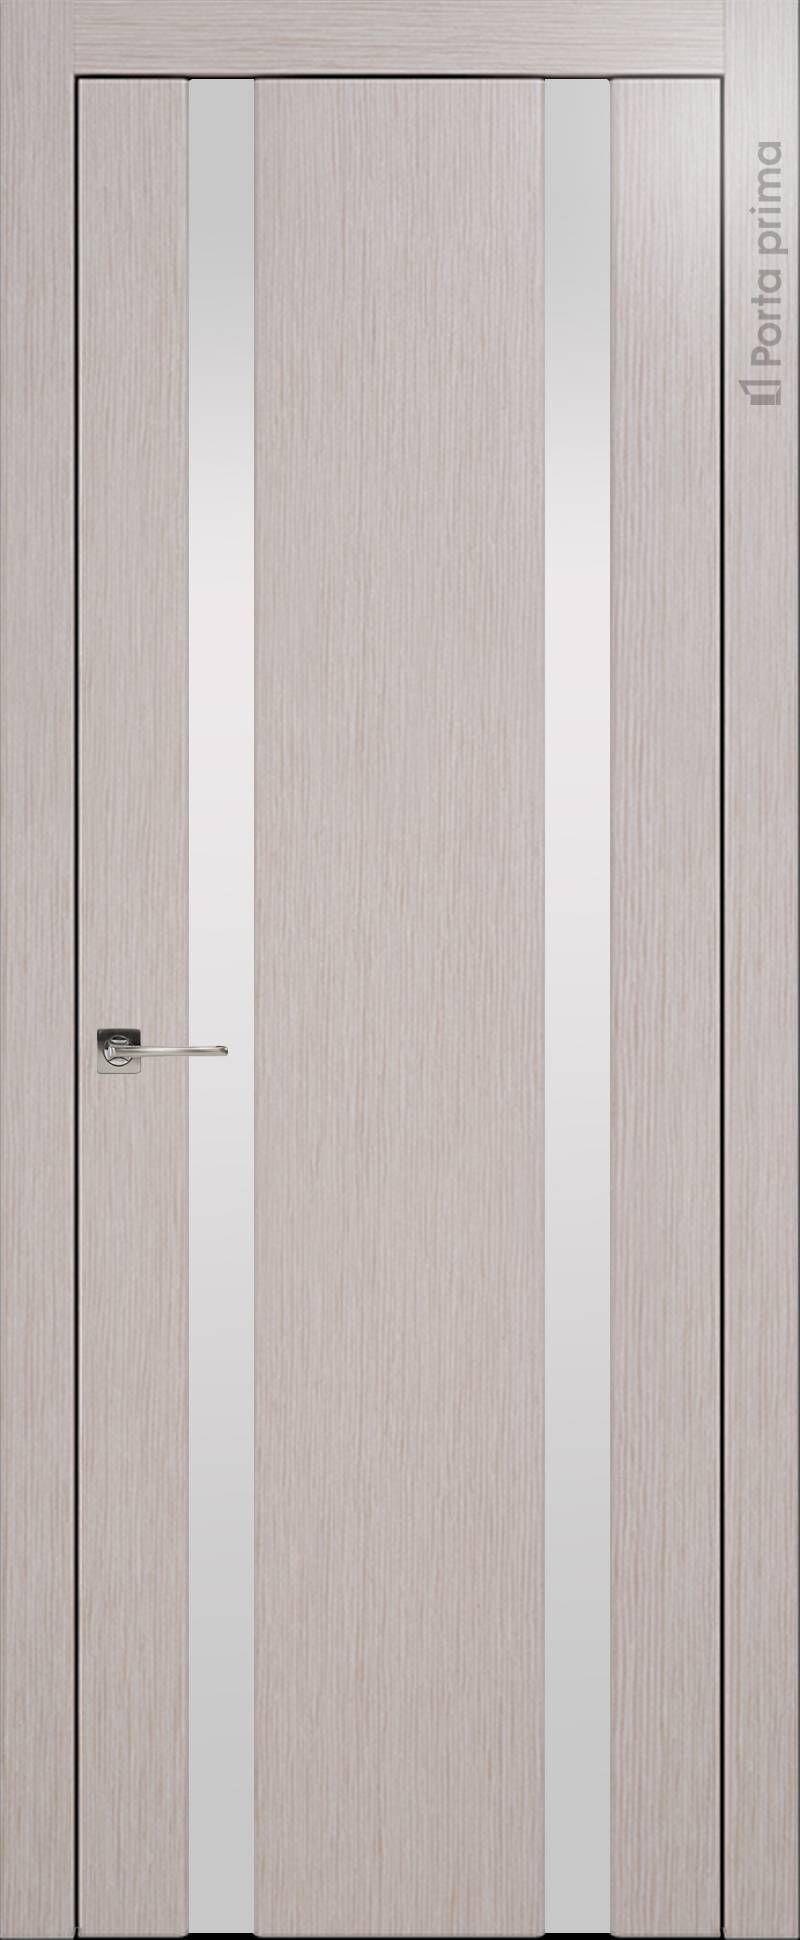 Torino цвет - Дымчатый дуб Без стекла (ДГ-2)